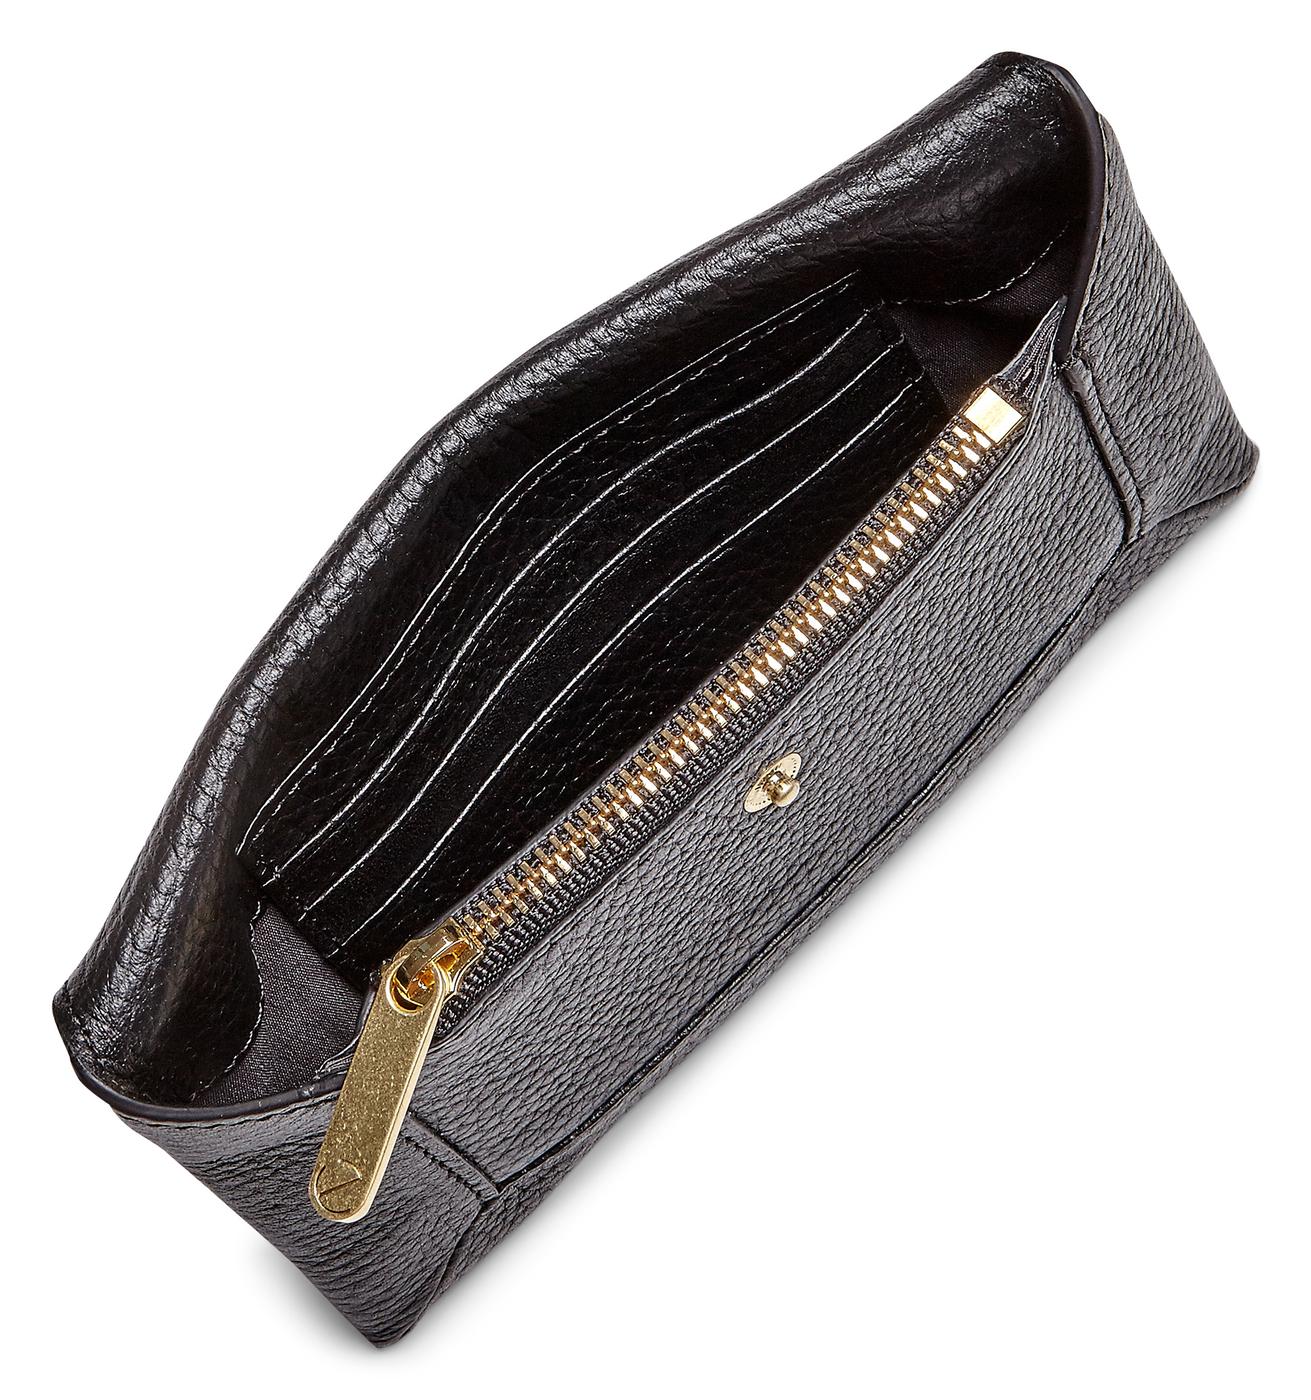 ECCO Isan 2 Small Wallet